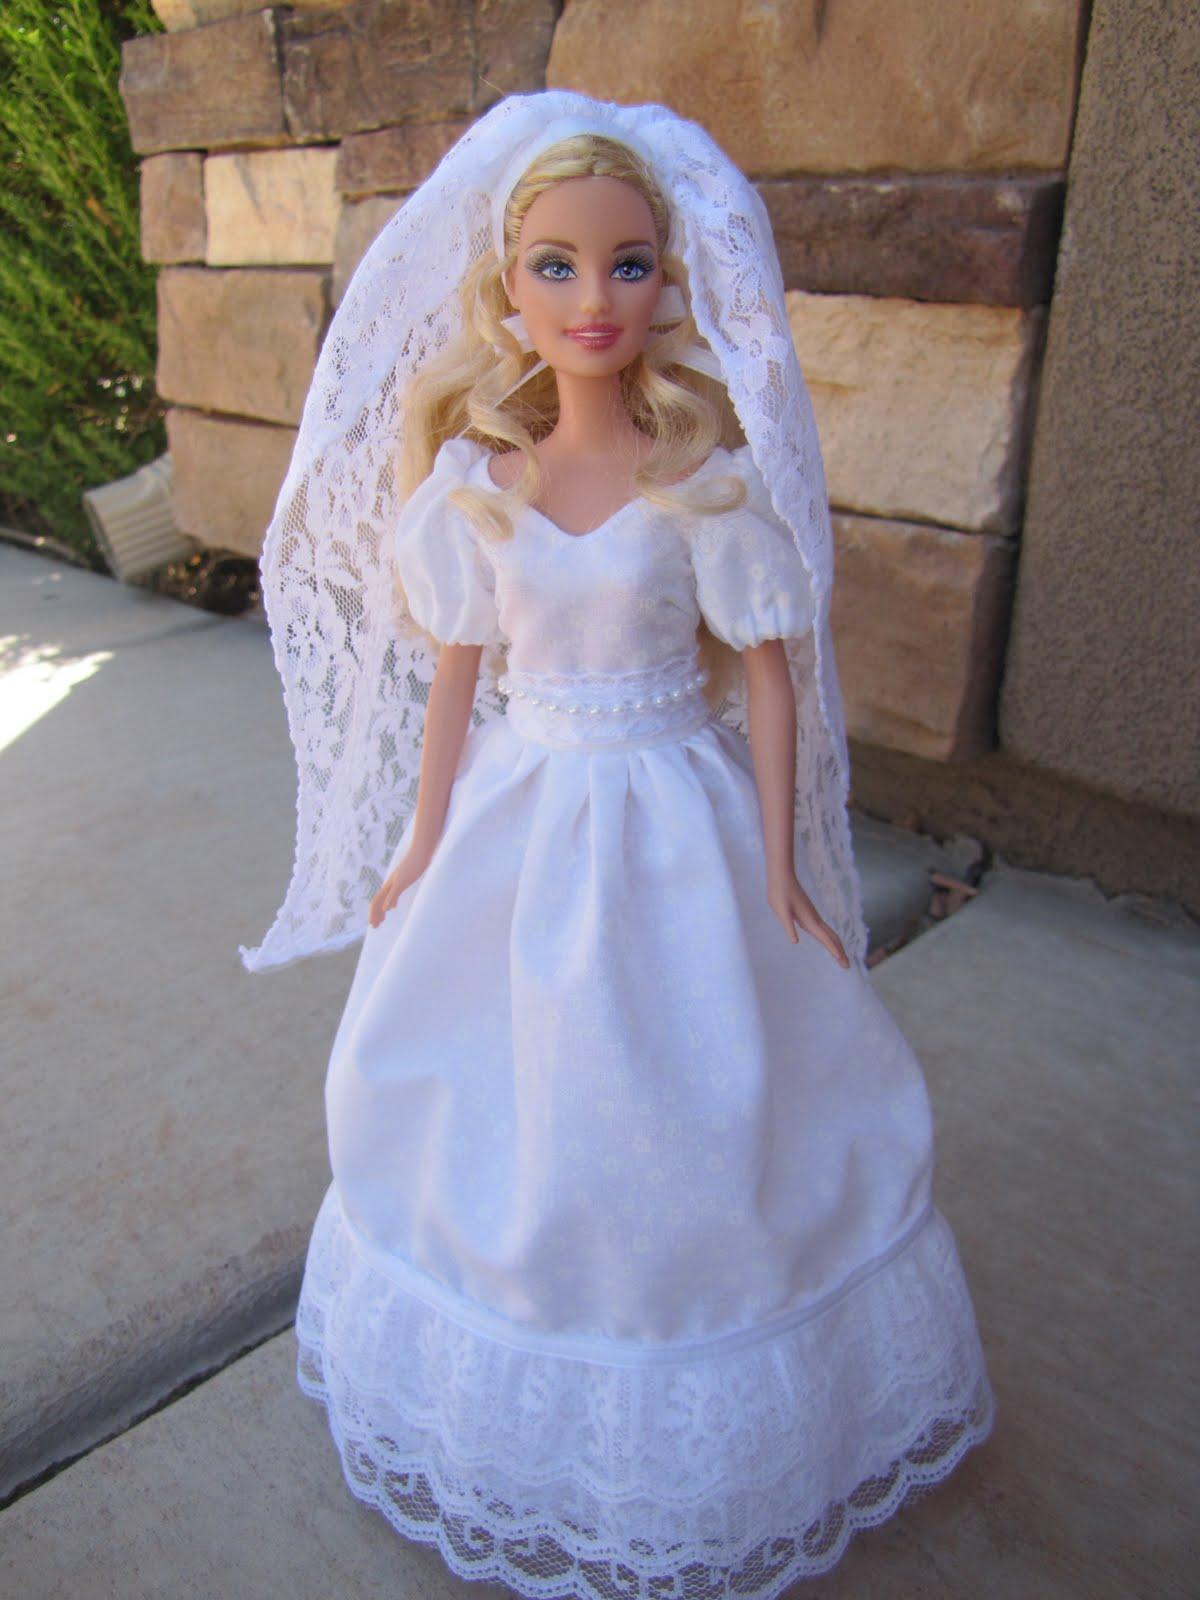 Modest Barbie Style Blushing Bride